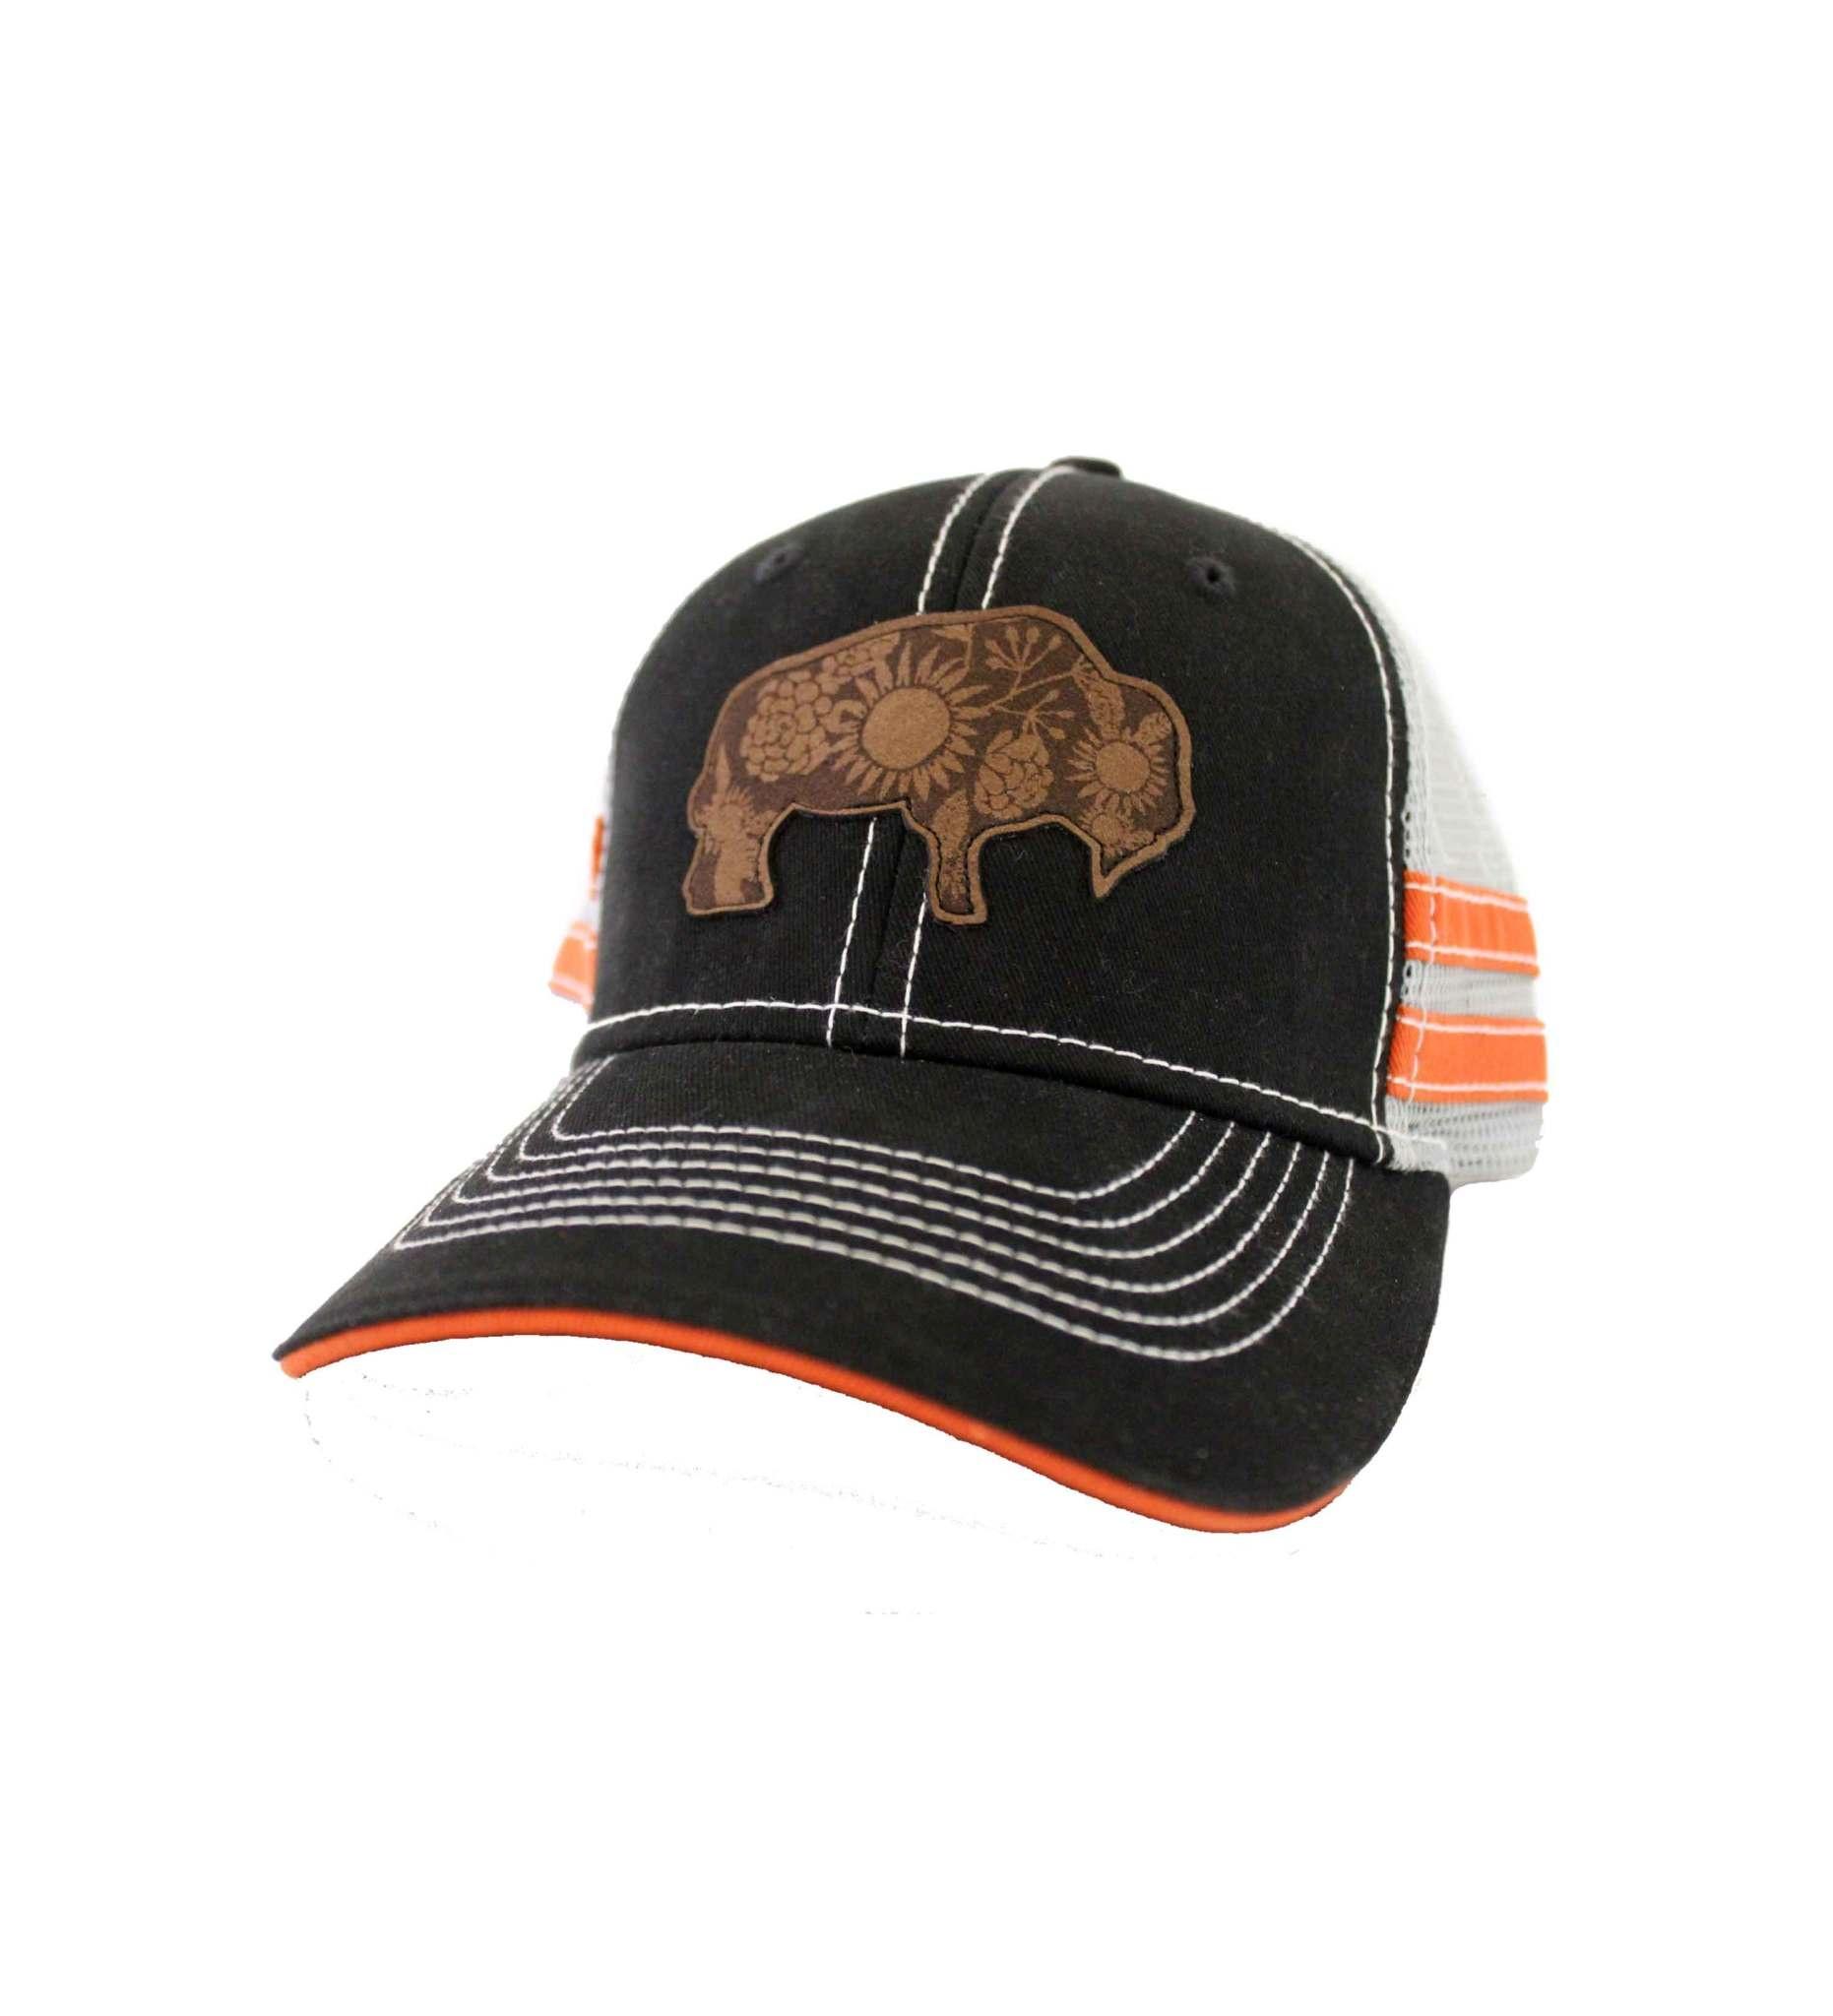 Black & Gray Buffalo Cap